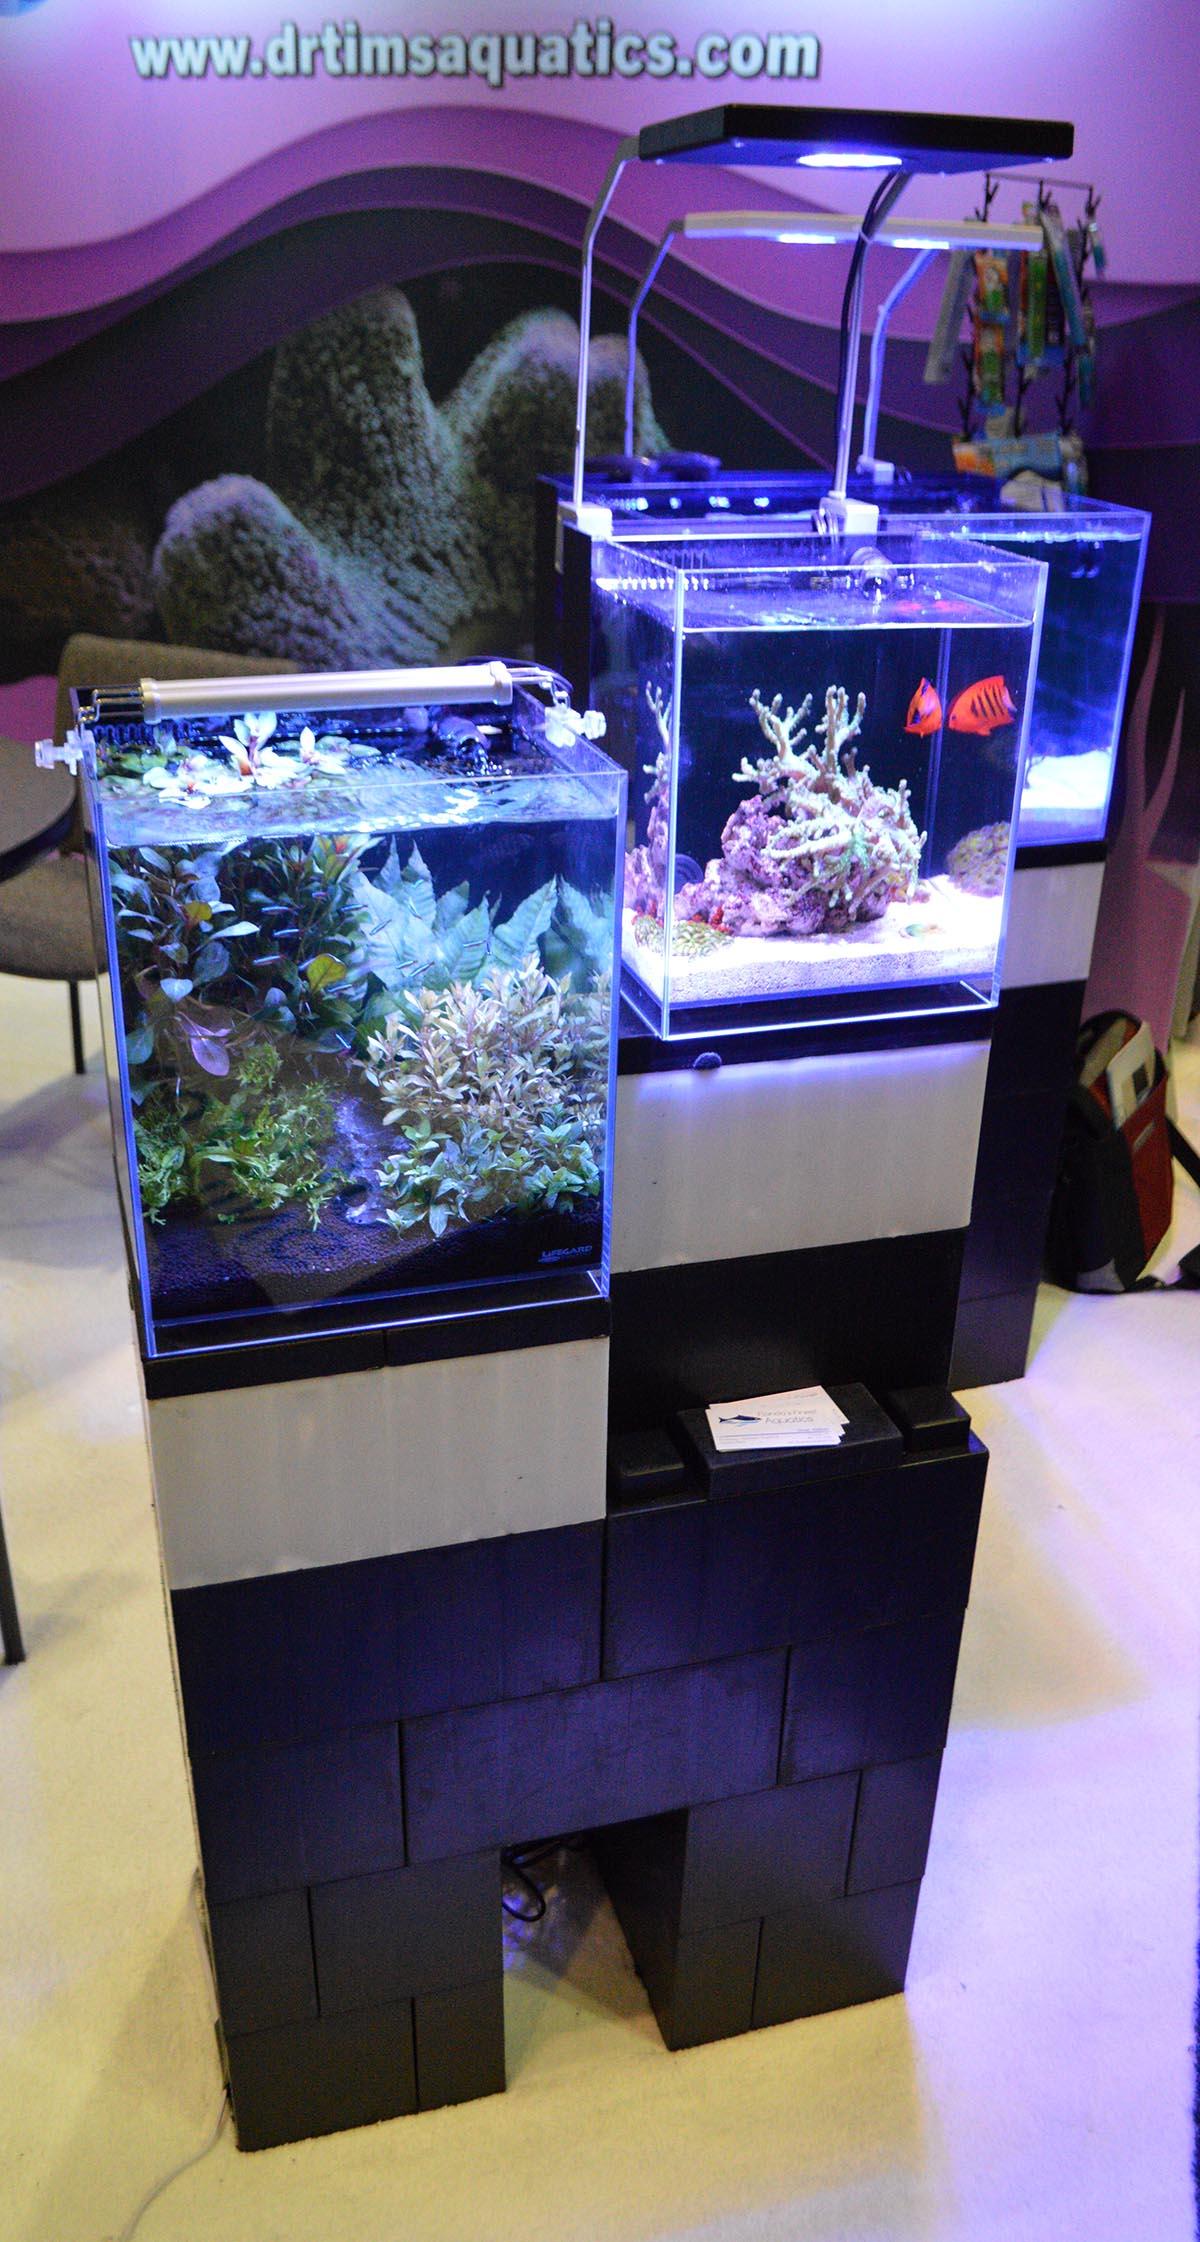 Lifegard's Elevated series of aquariums dominated the Dr. Tim's Aquatics display.